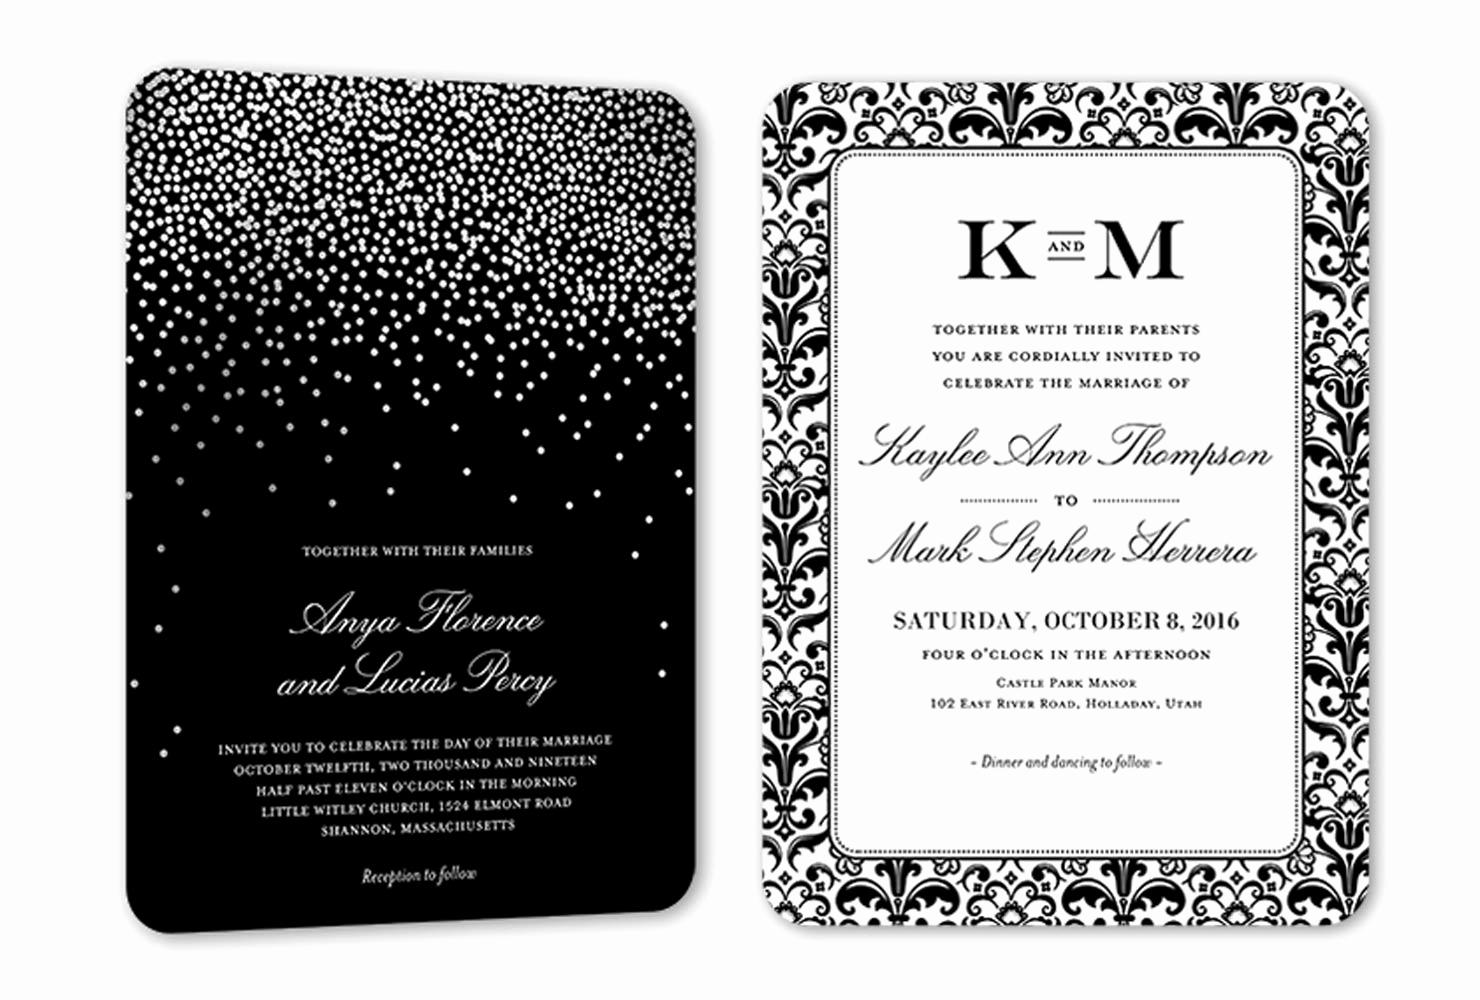 Wedding Invitation Wording Couple Hosting Awesome 35 Wedding Invitation Wording Examples 2019